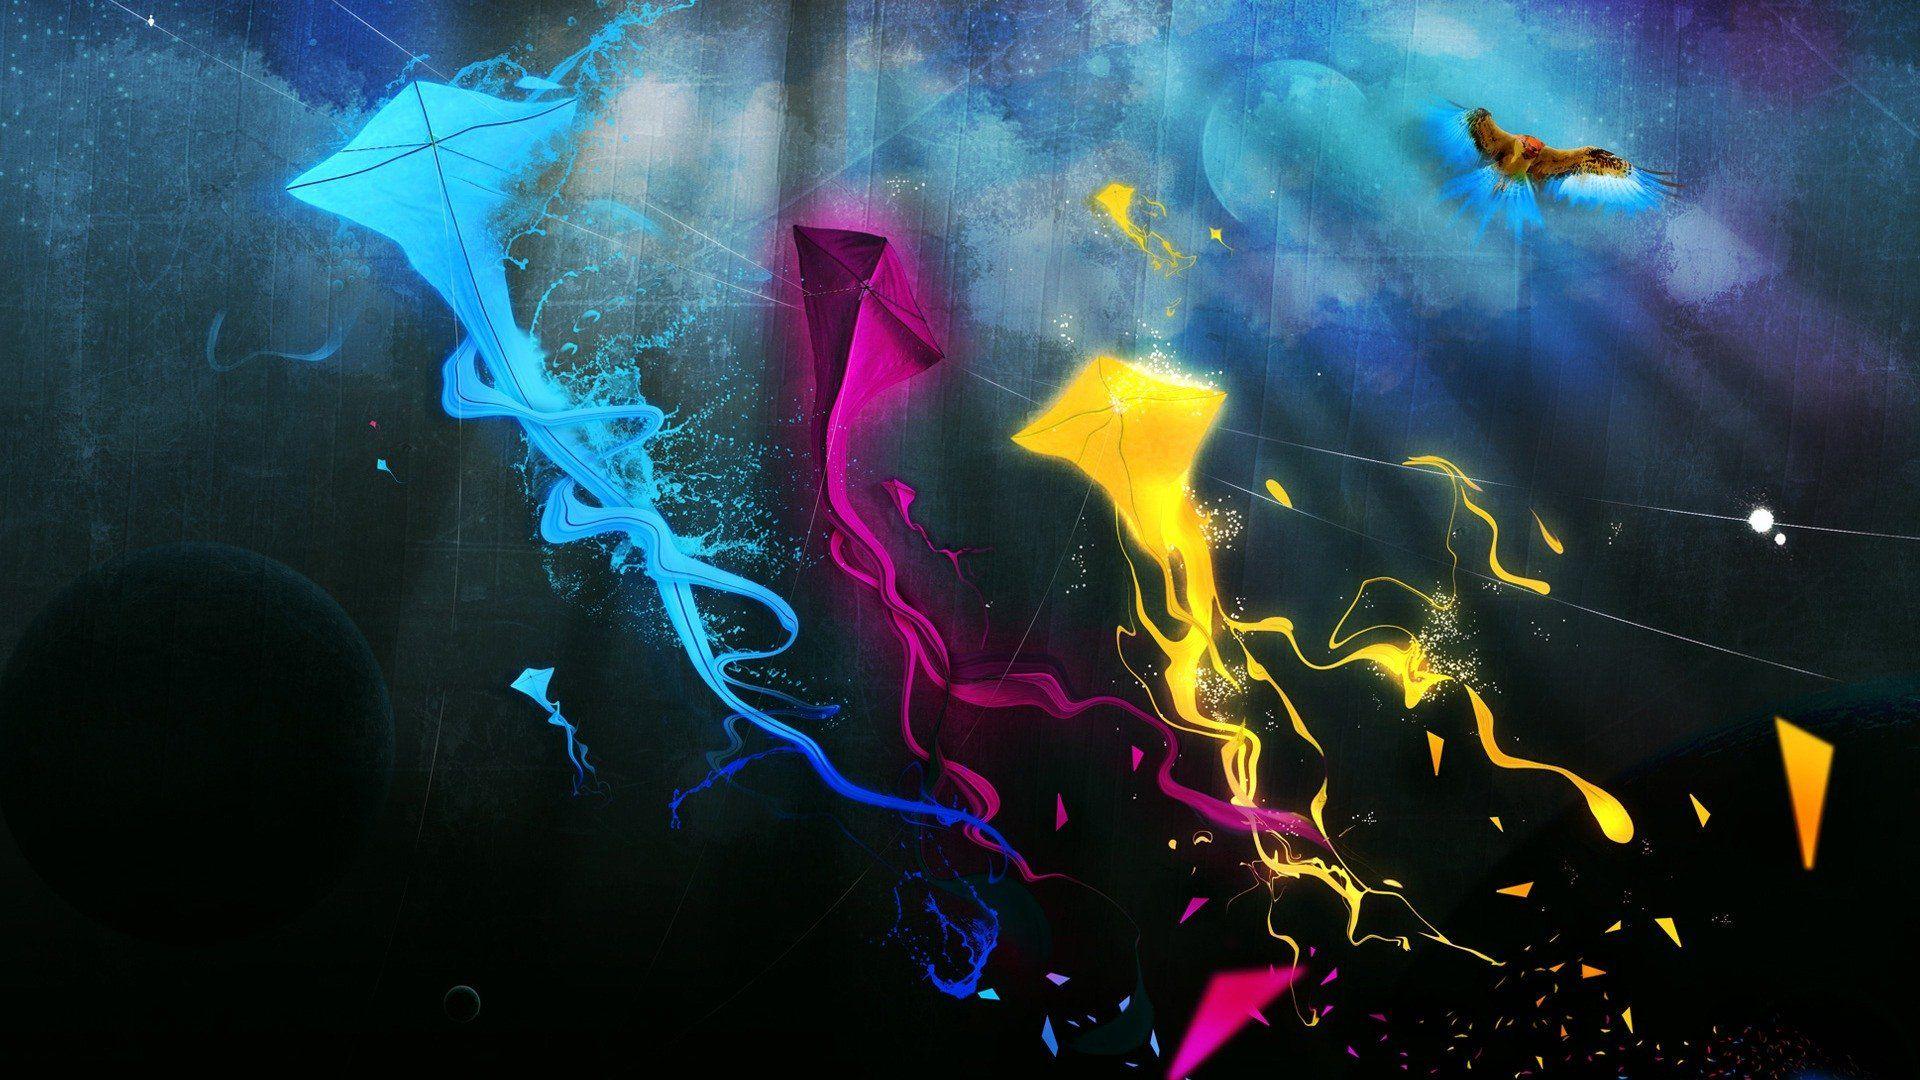 Graphic Design background hd